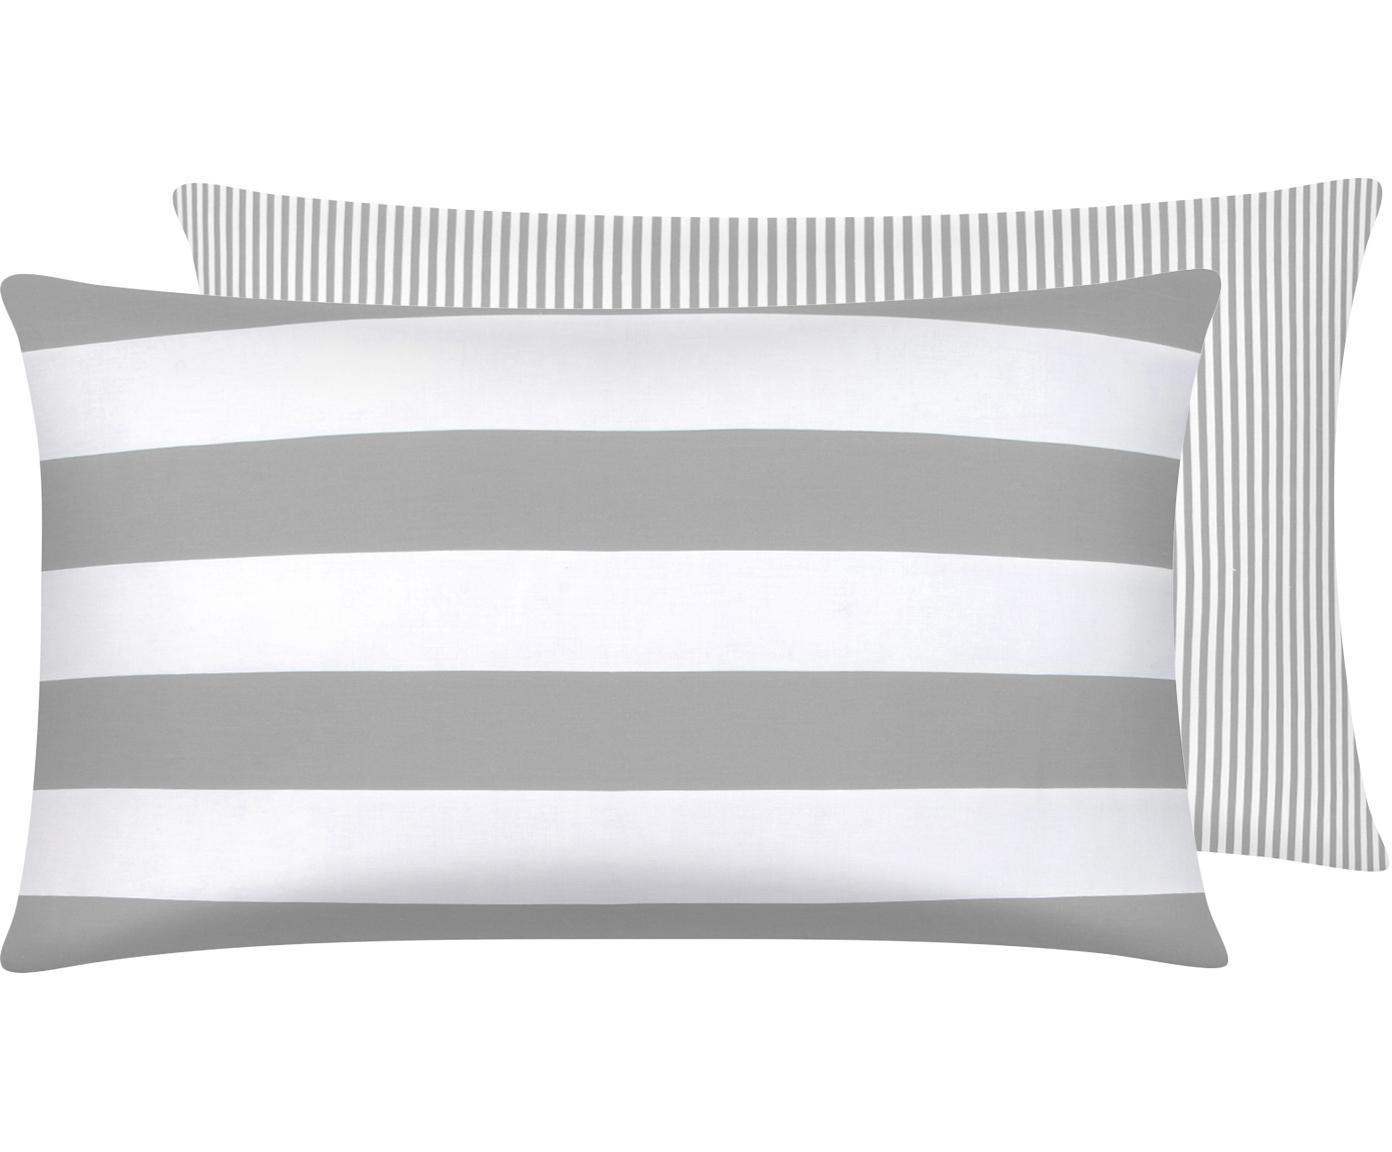 Funda de almohada de tejido renforcé Lorena, caras distintas, Gris claro, crema, An 50 x L 70 cm